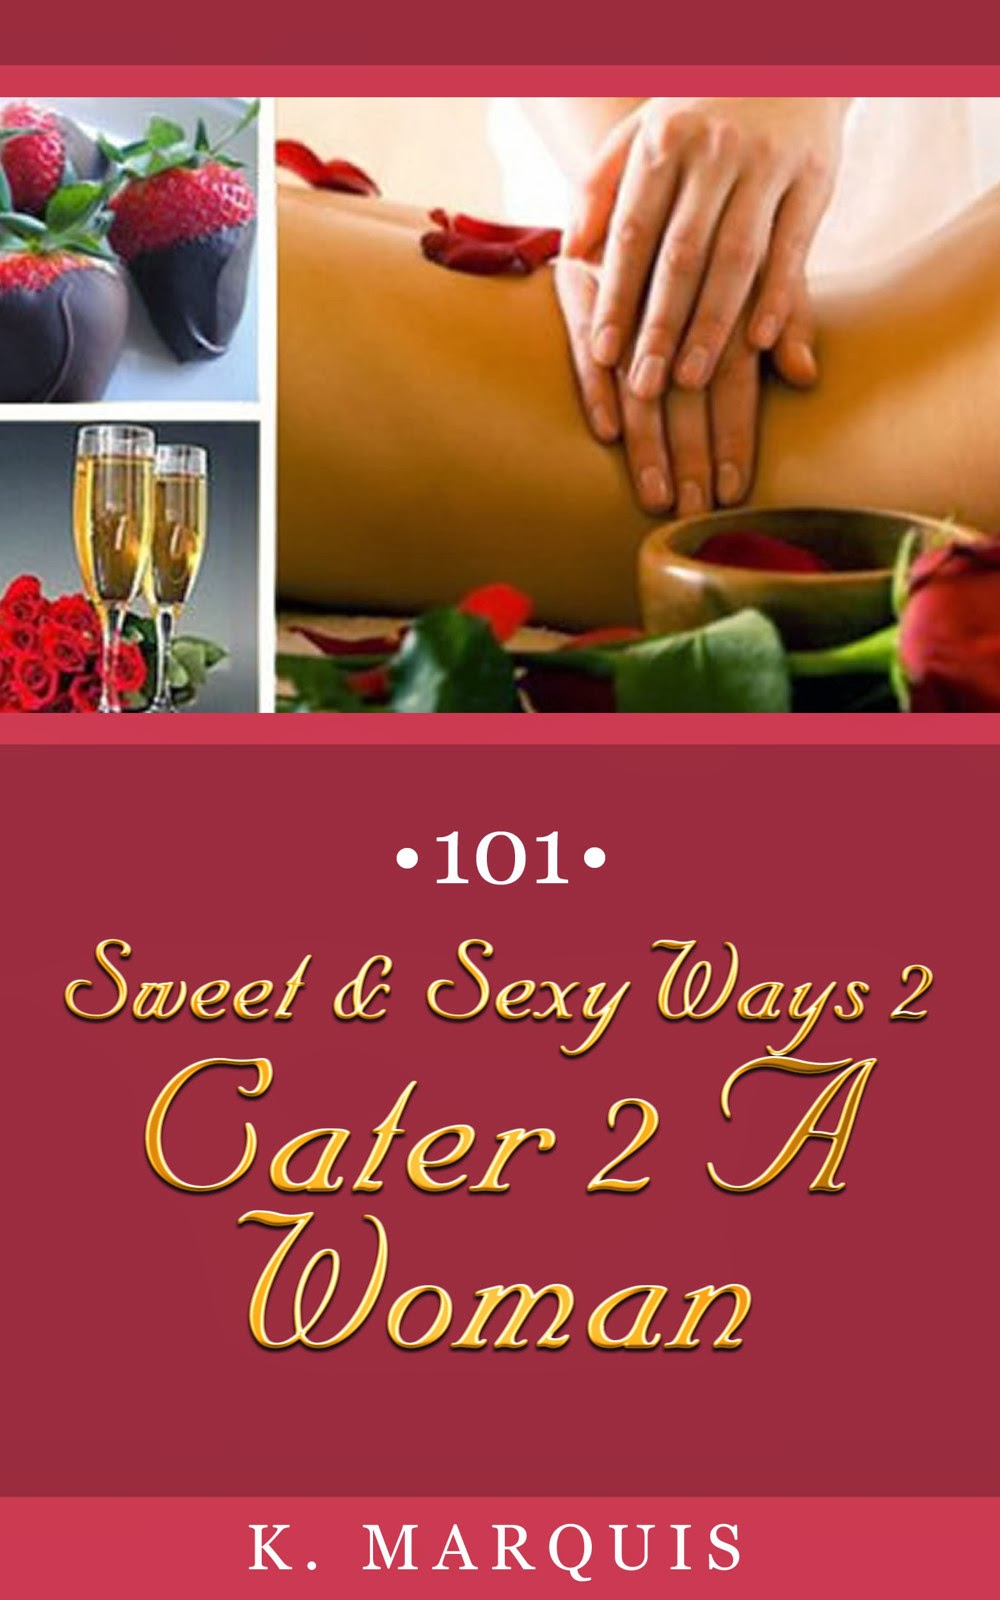 http://www.amazon.com/Sweet-Sexy-Ways-Cater-Woman-ebook/dp/B00I4KBMDC/ref=sr_1_cc_1?s=aps&ie=UTF8&qid=1391191121&sr=1-1-catcorr&keywords=101+Sweet+%26+Sexy+Ways+2+Cater+to+A+Woman